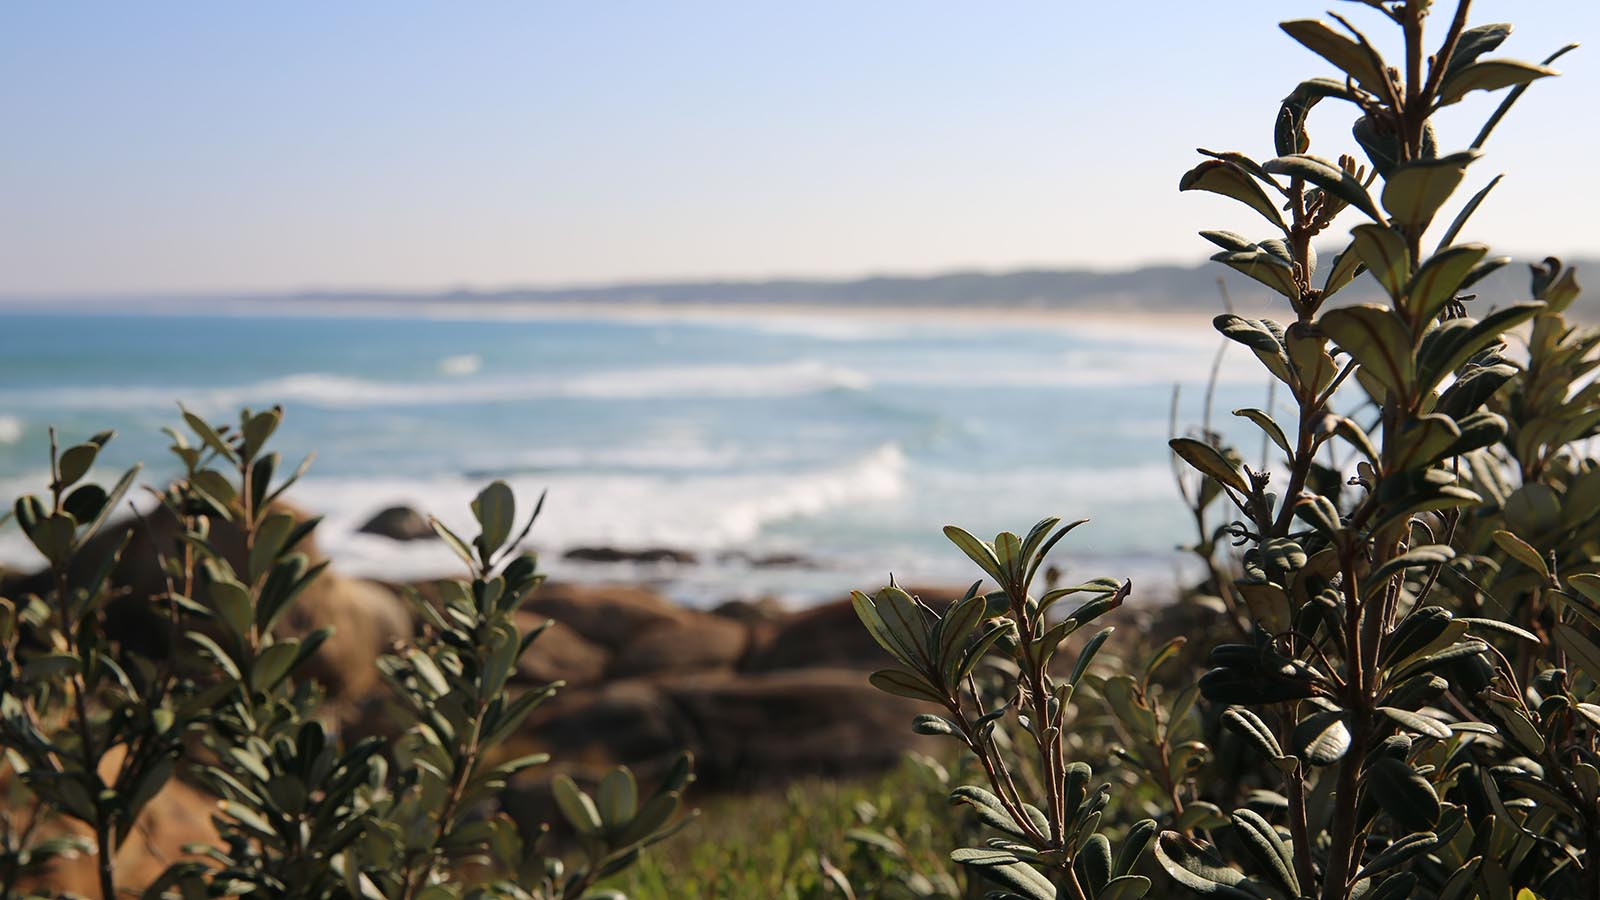 Cape Conran Coastal Park, Gippsland, Victoria, Australia